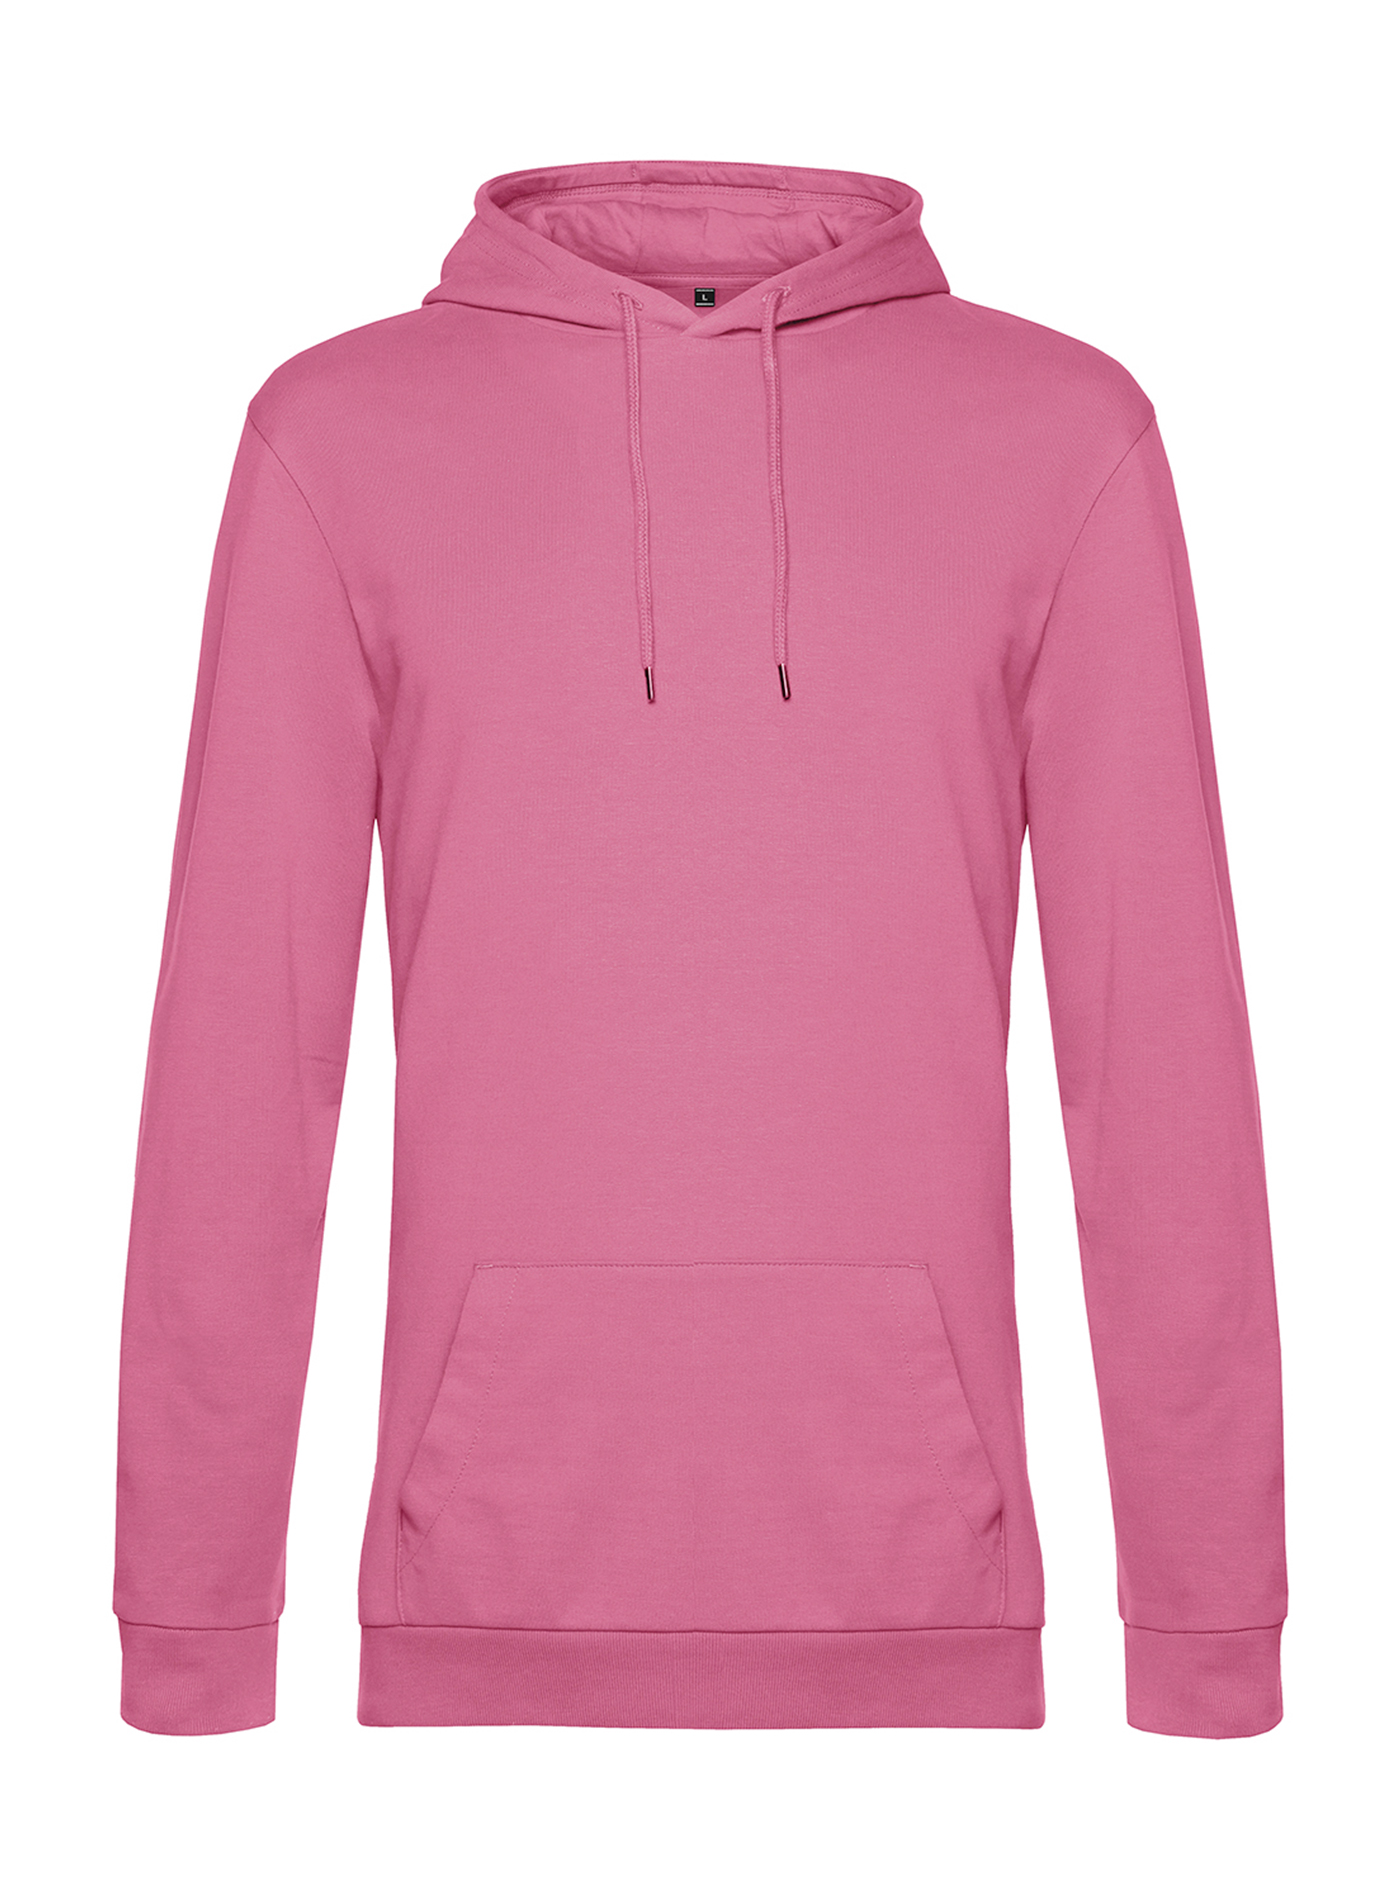 Pánská mikina Terry - Růžová M